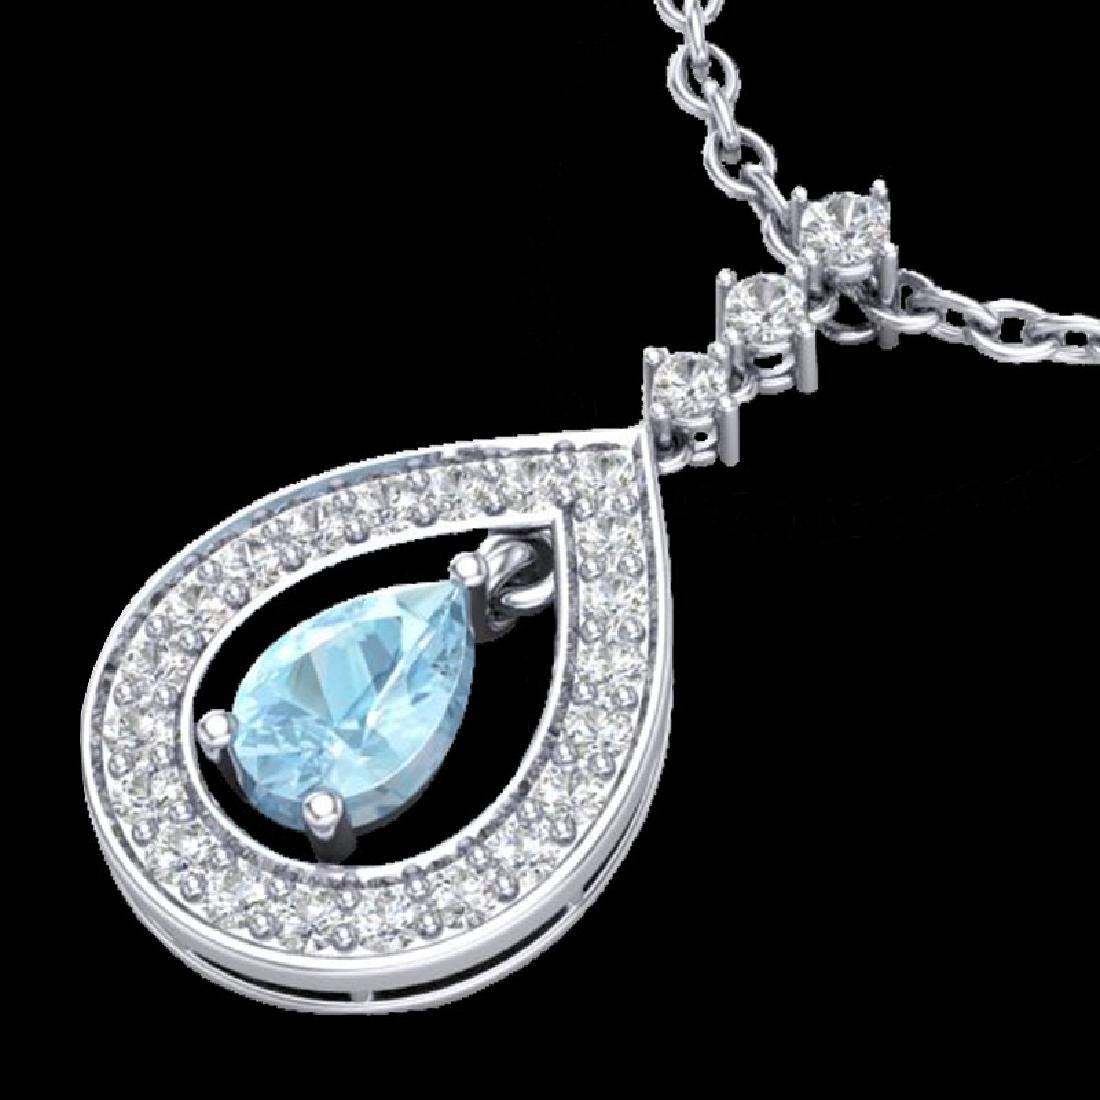 1.15 CTW Aquamarine & Micro Pave VS/SI Diamond Necklace